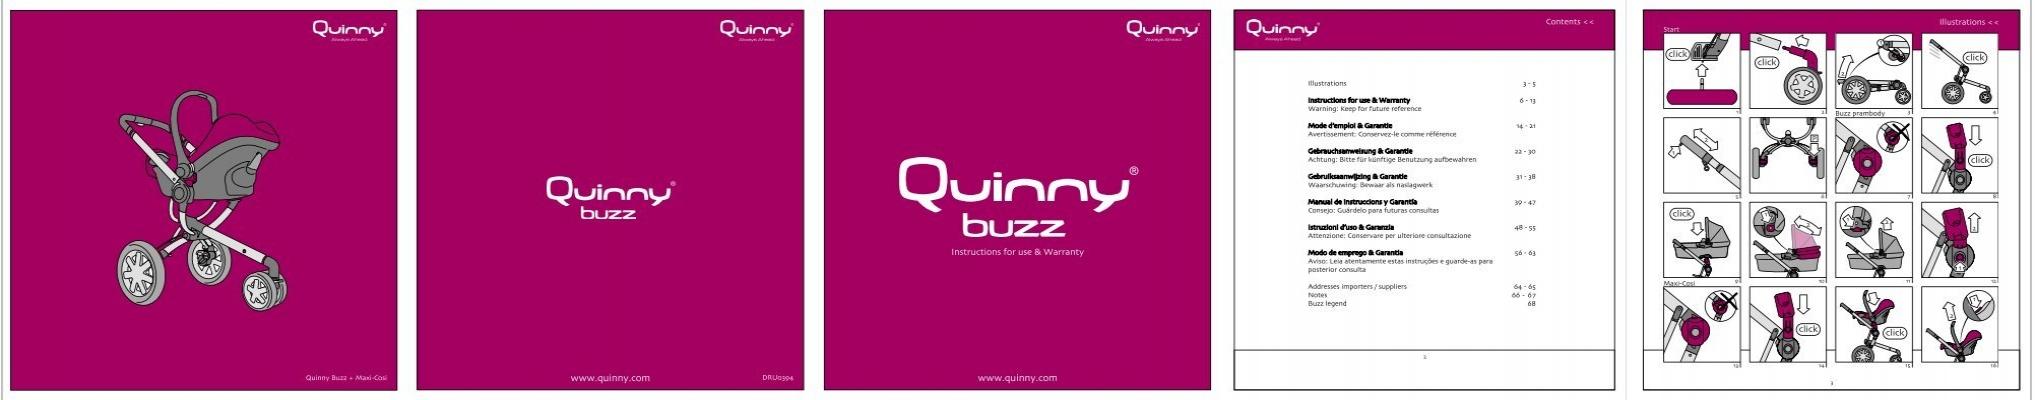 quinny buzz 3 instructions